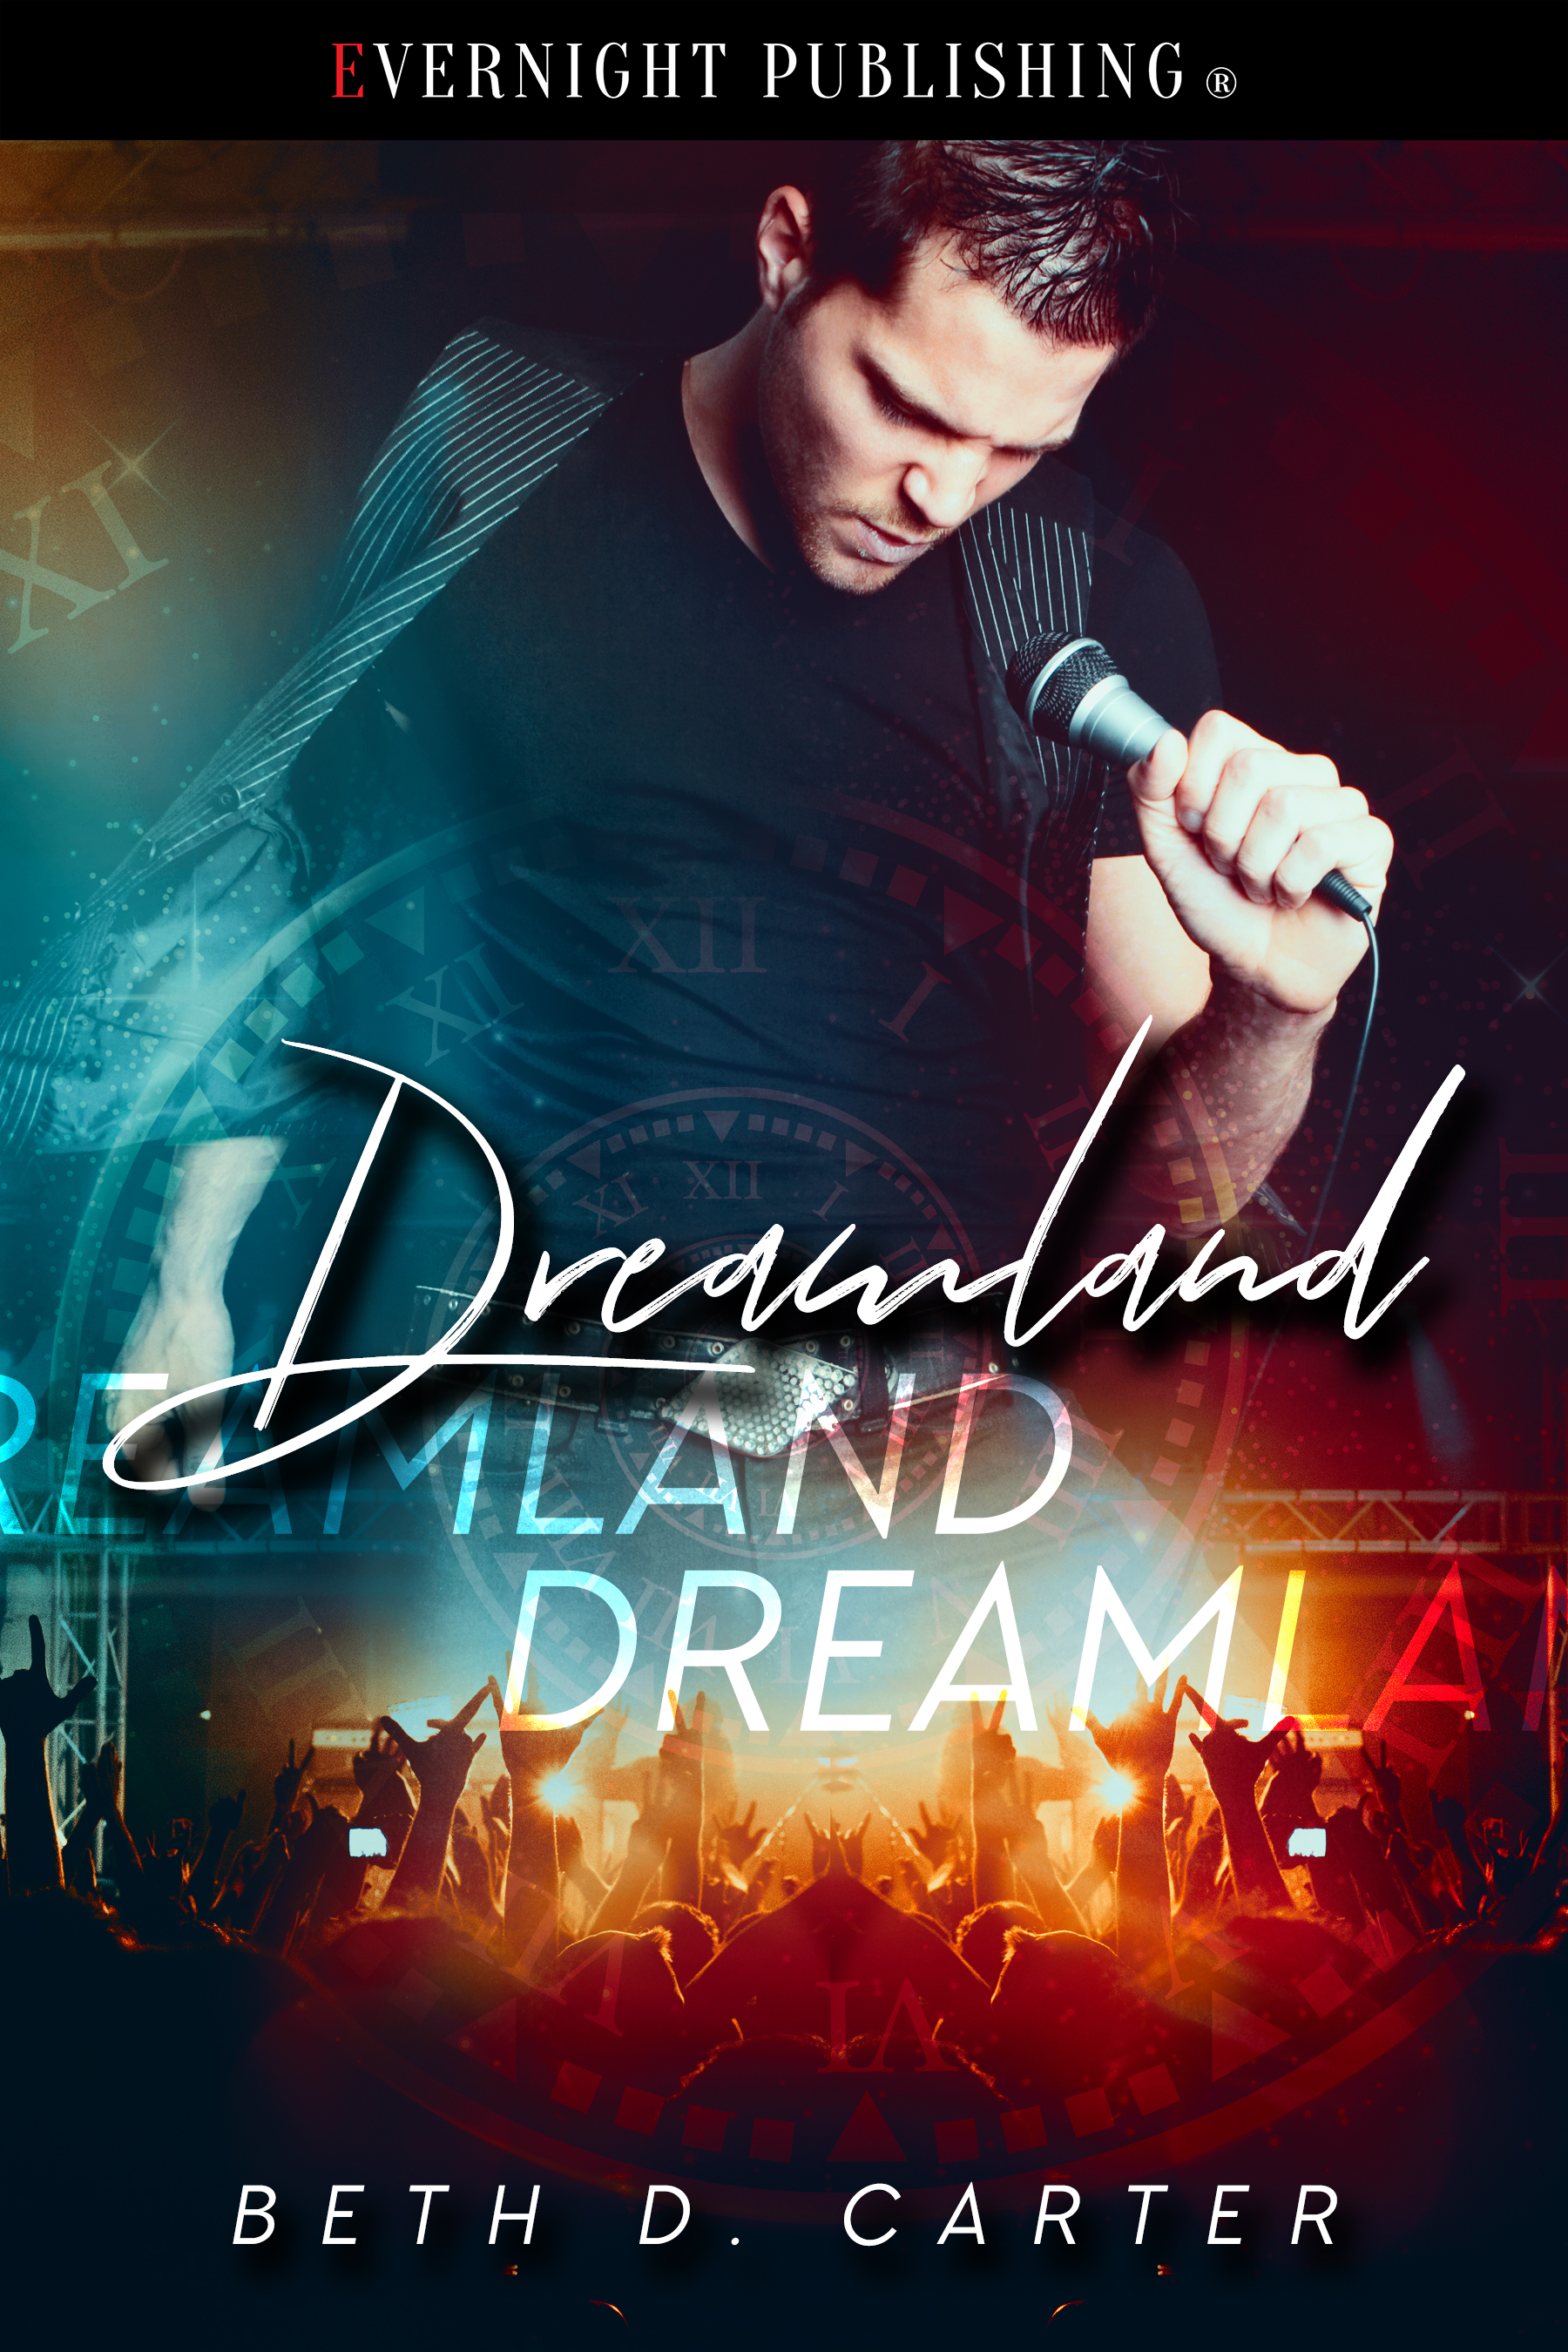 Materials: Dreamland cover